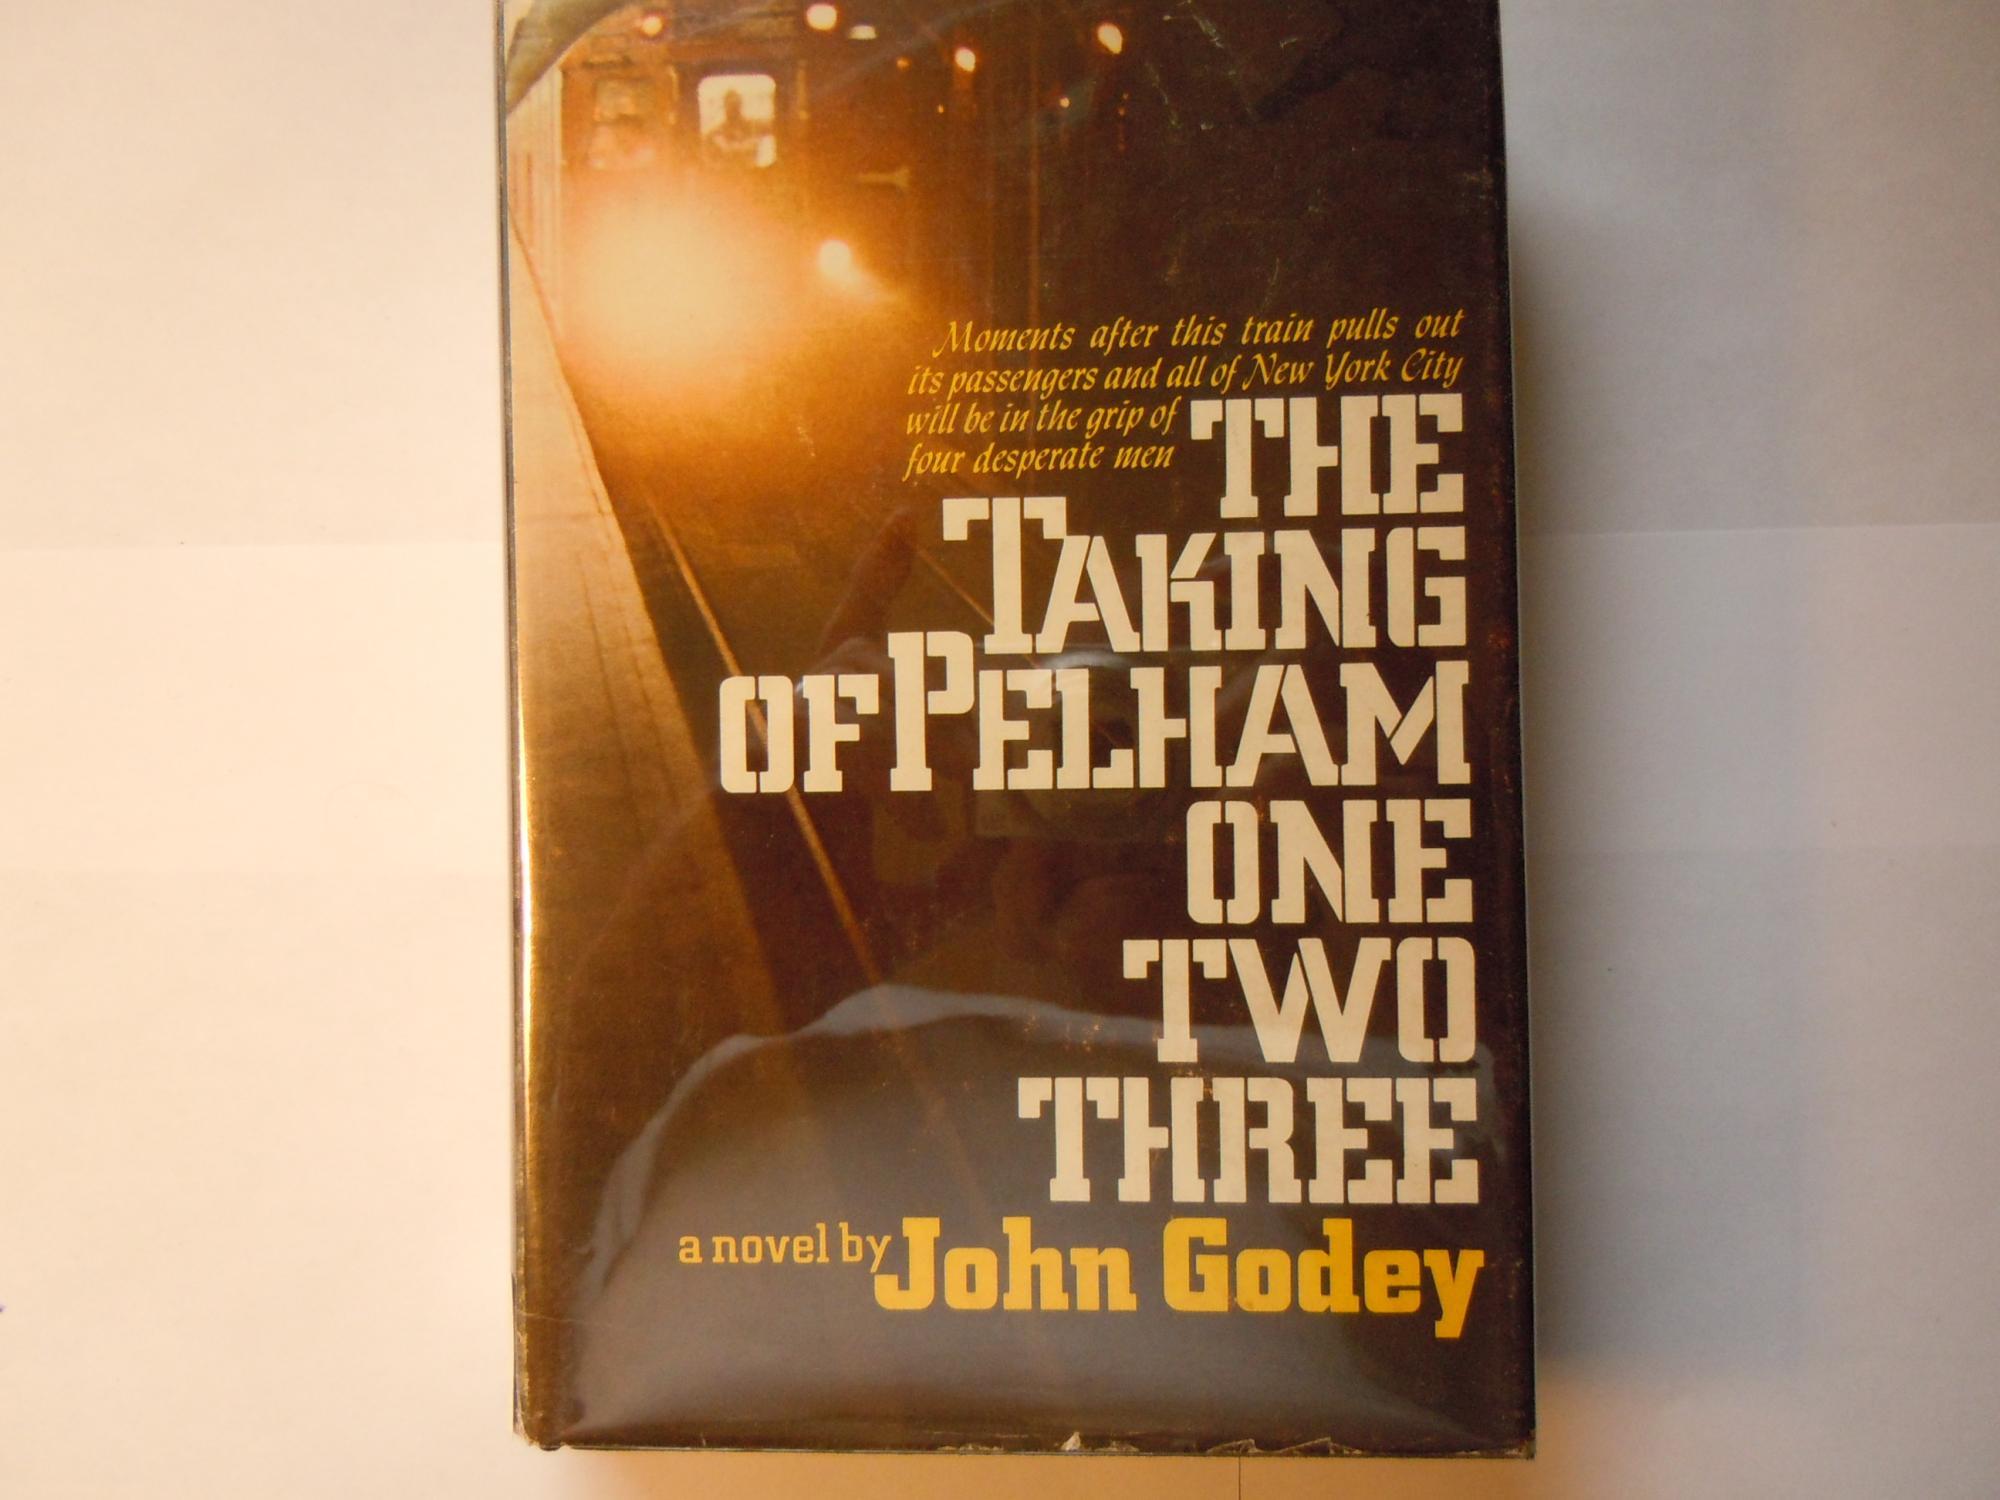 Taking of Pelham one two three Godey, John